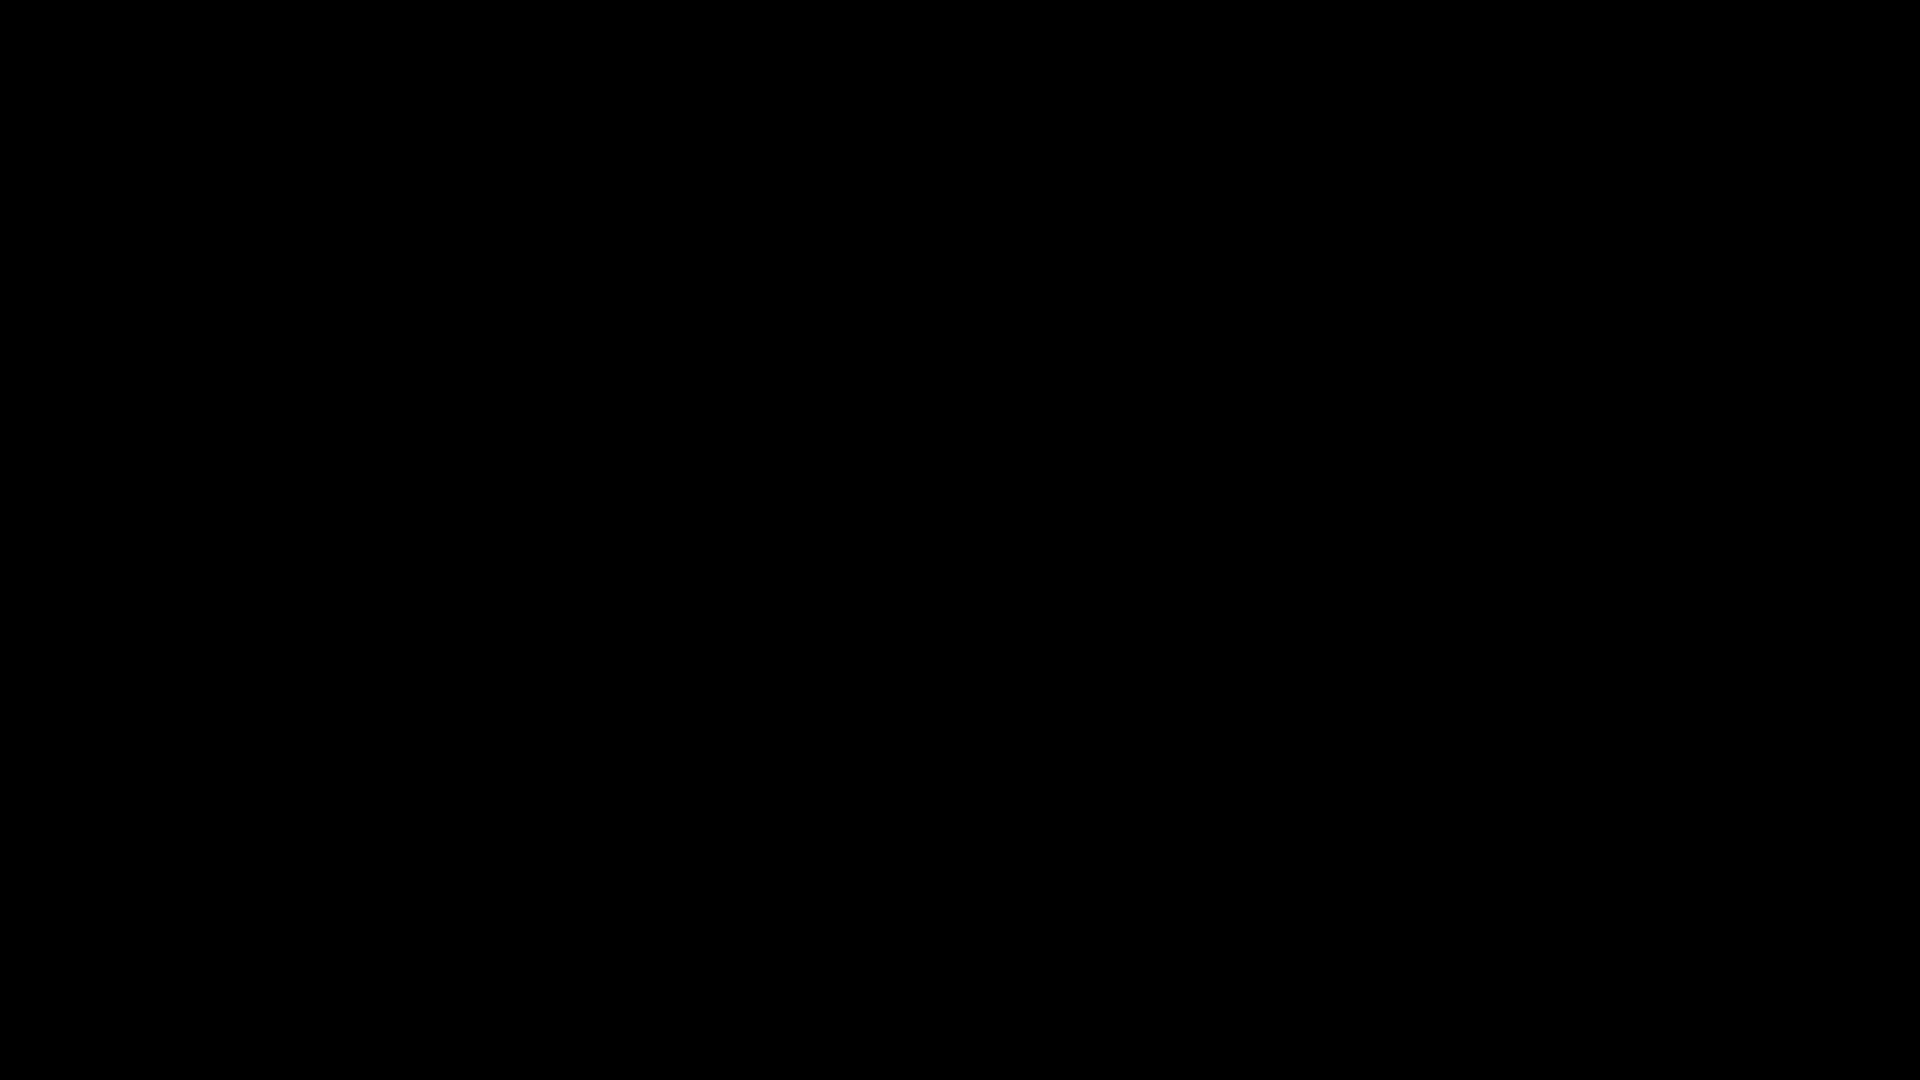 sliderelement Kneipen Käptn Schriftzug